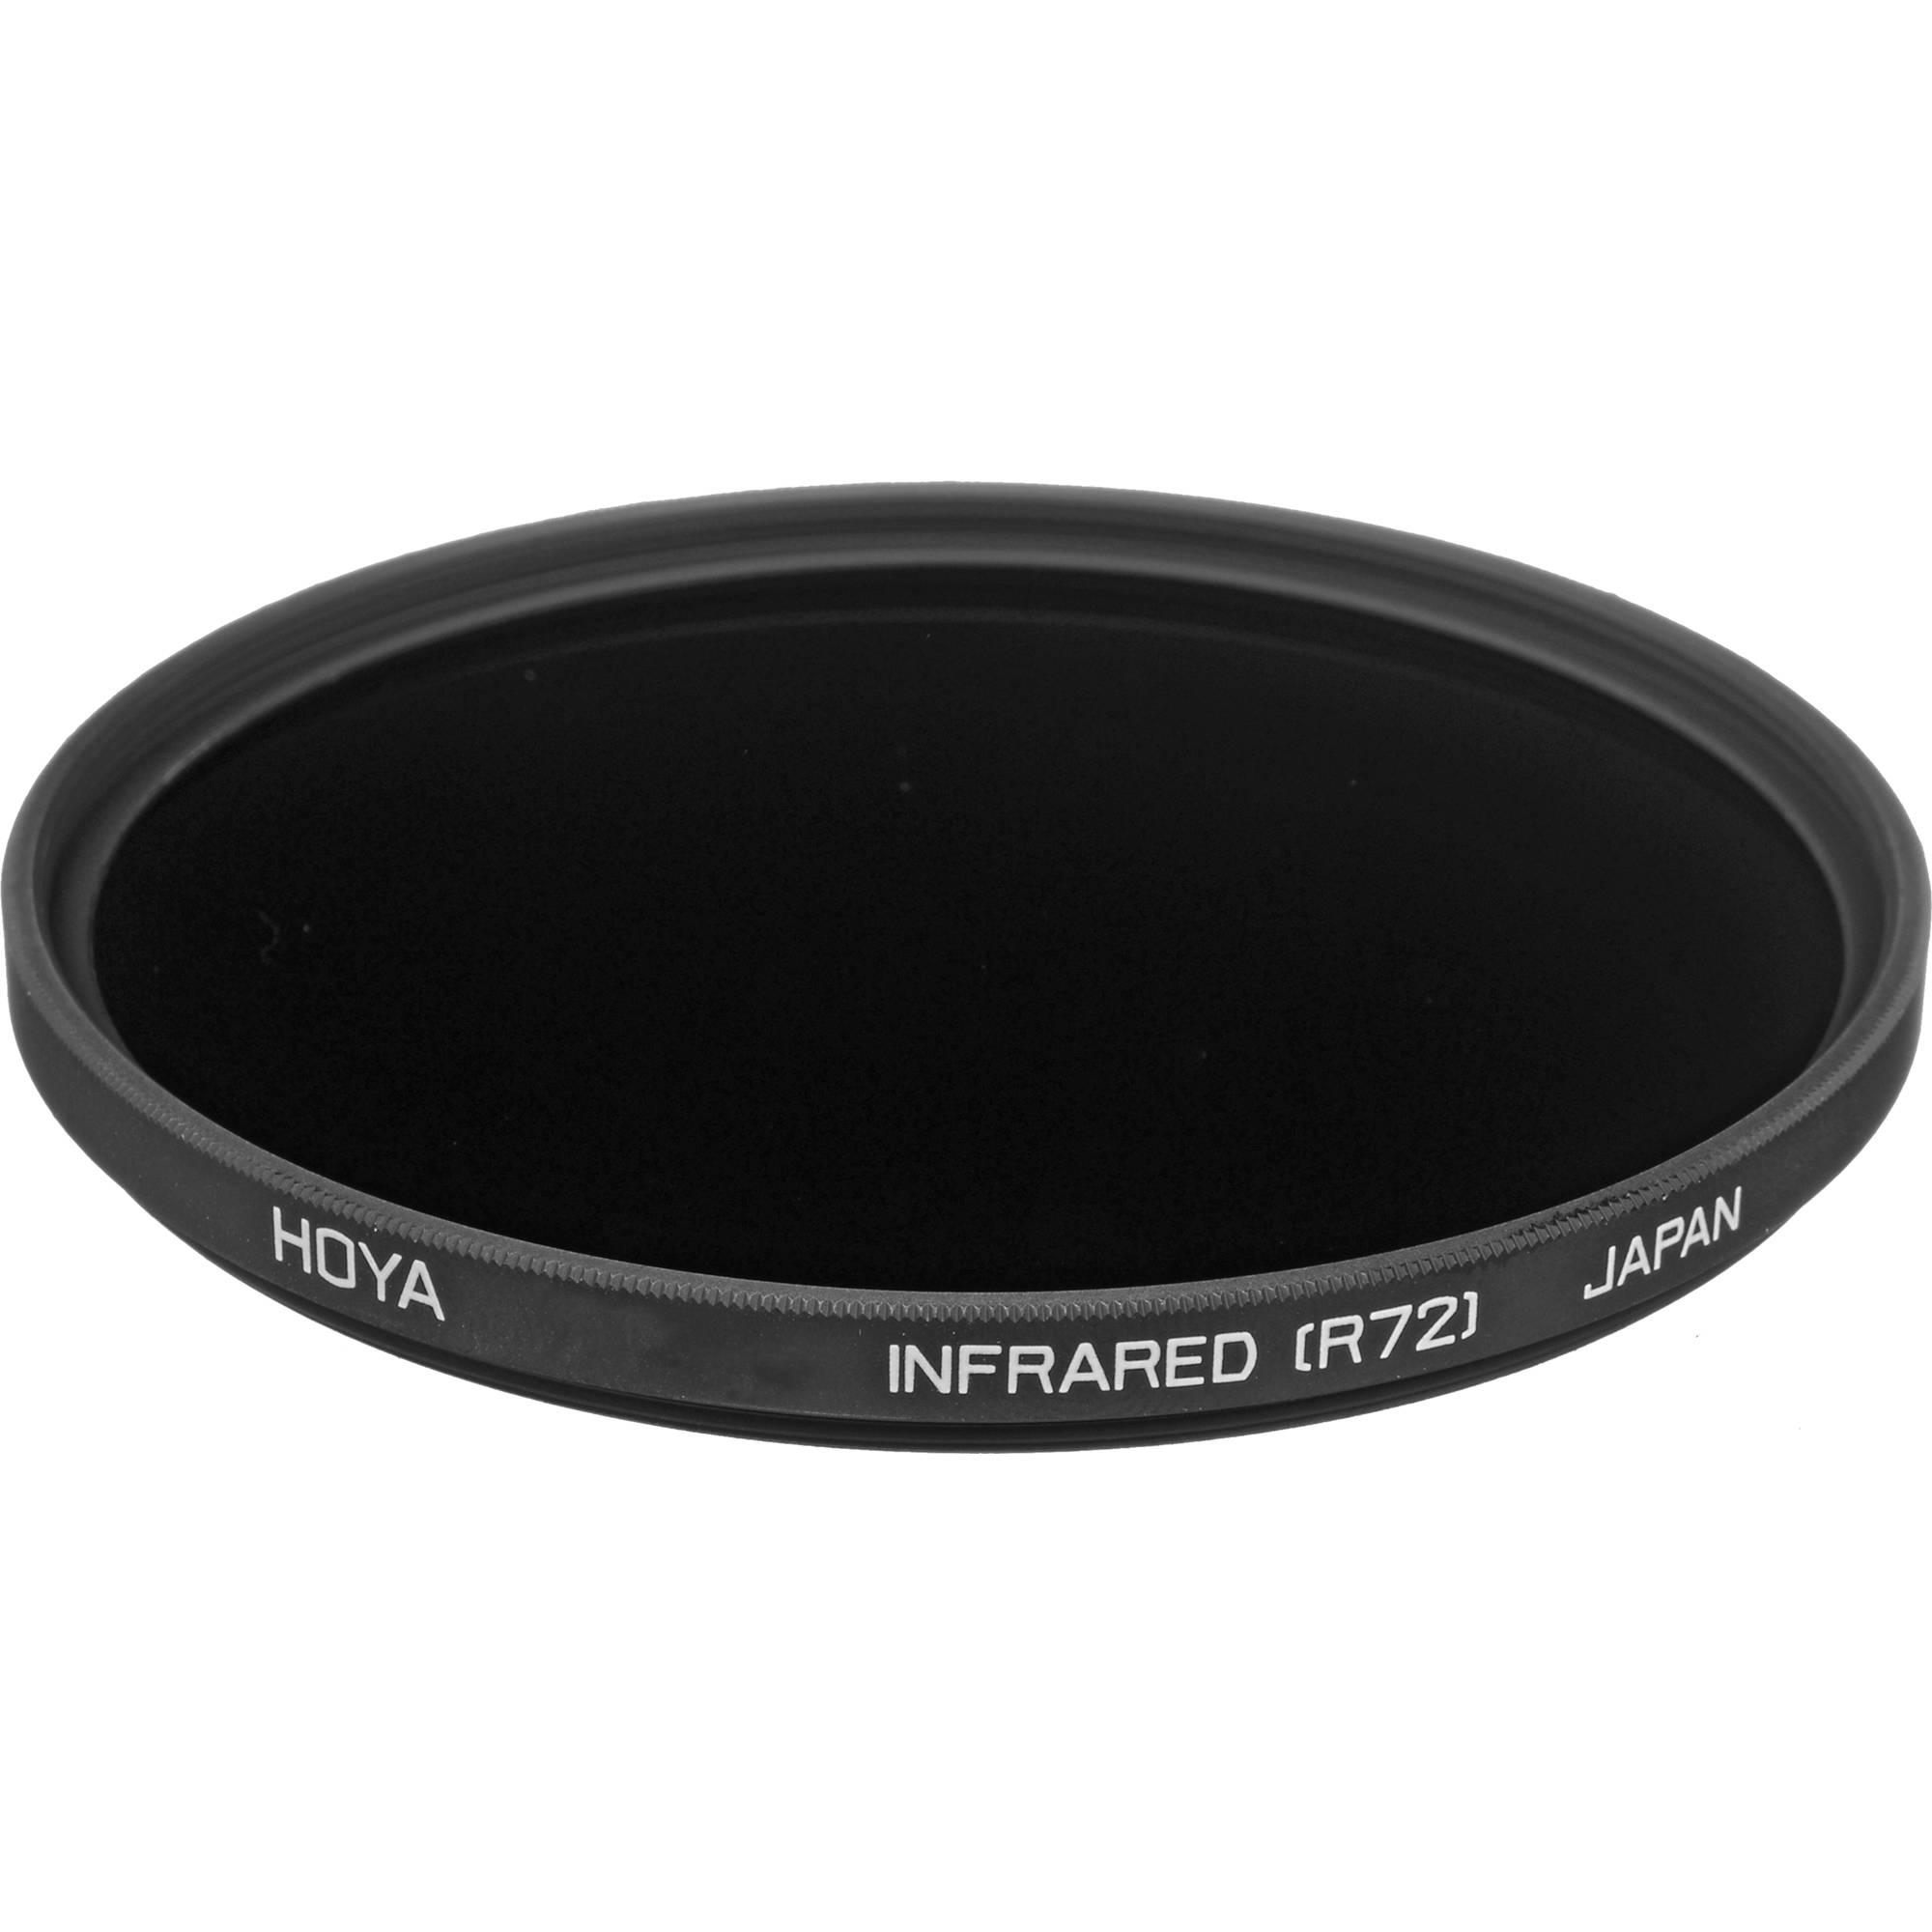 Hoya R72 IR filter